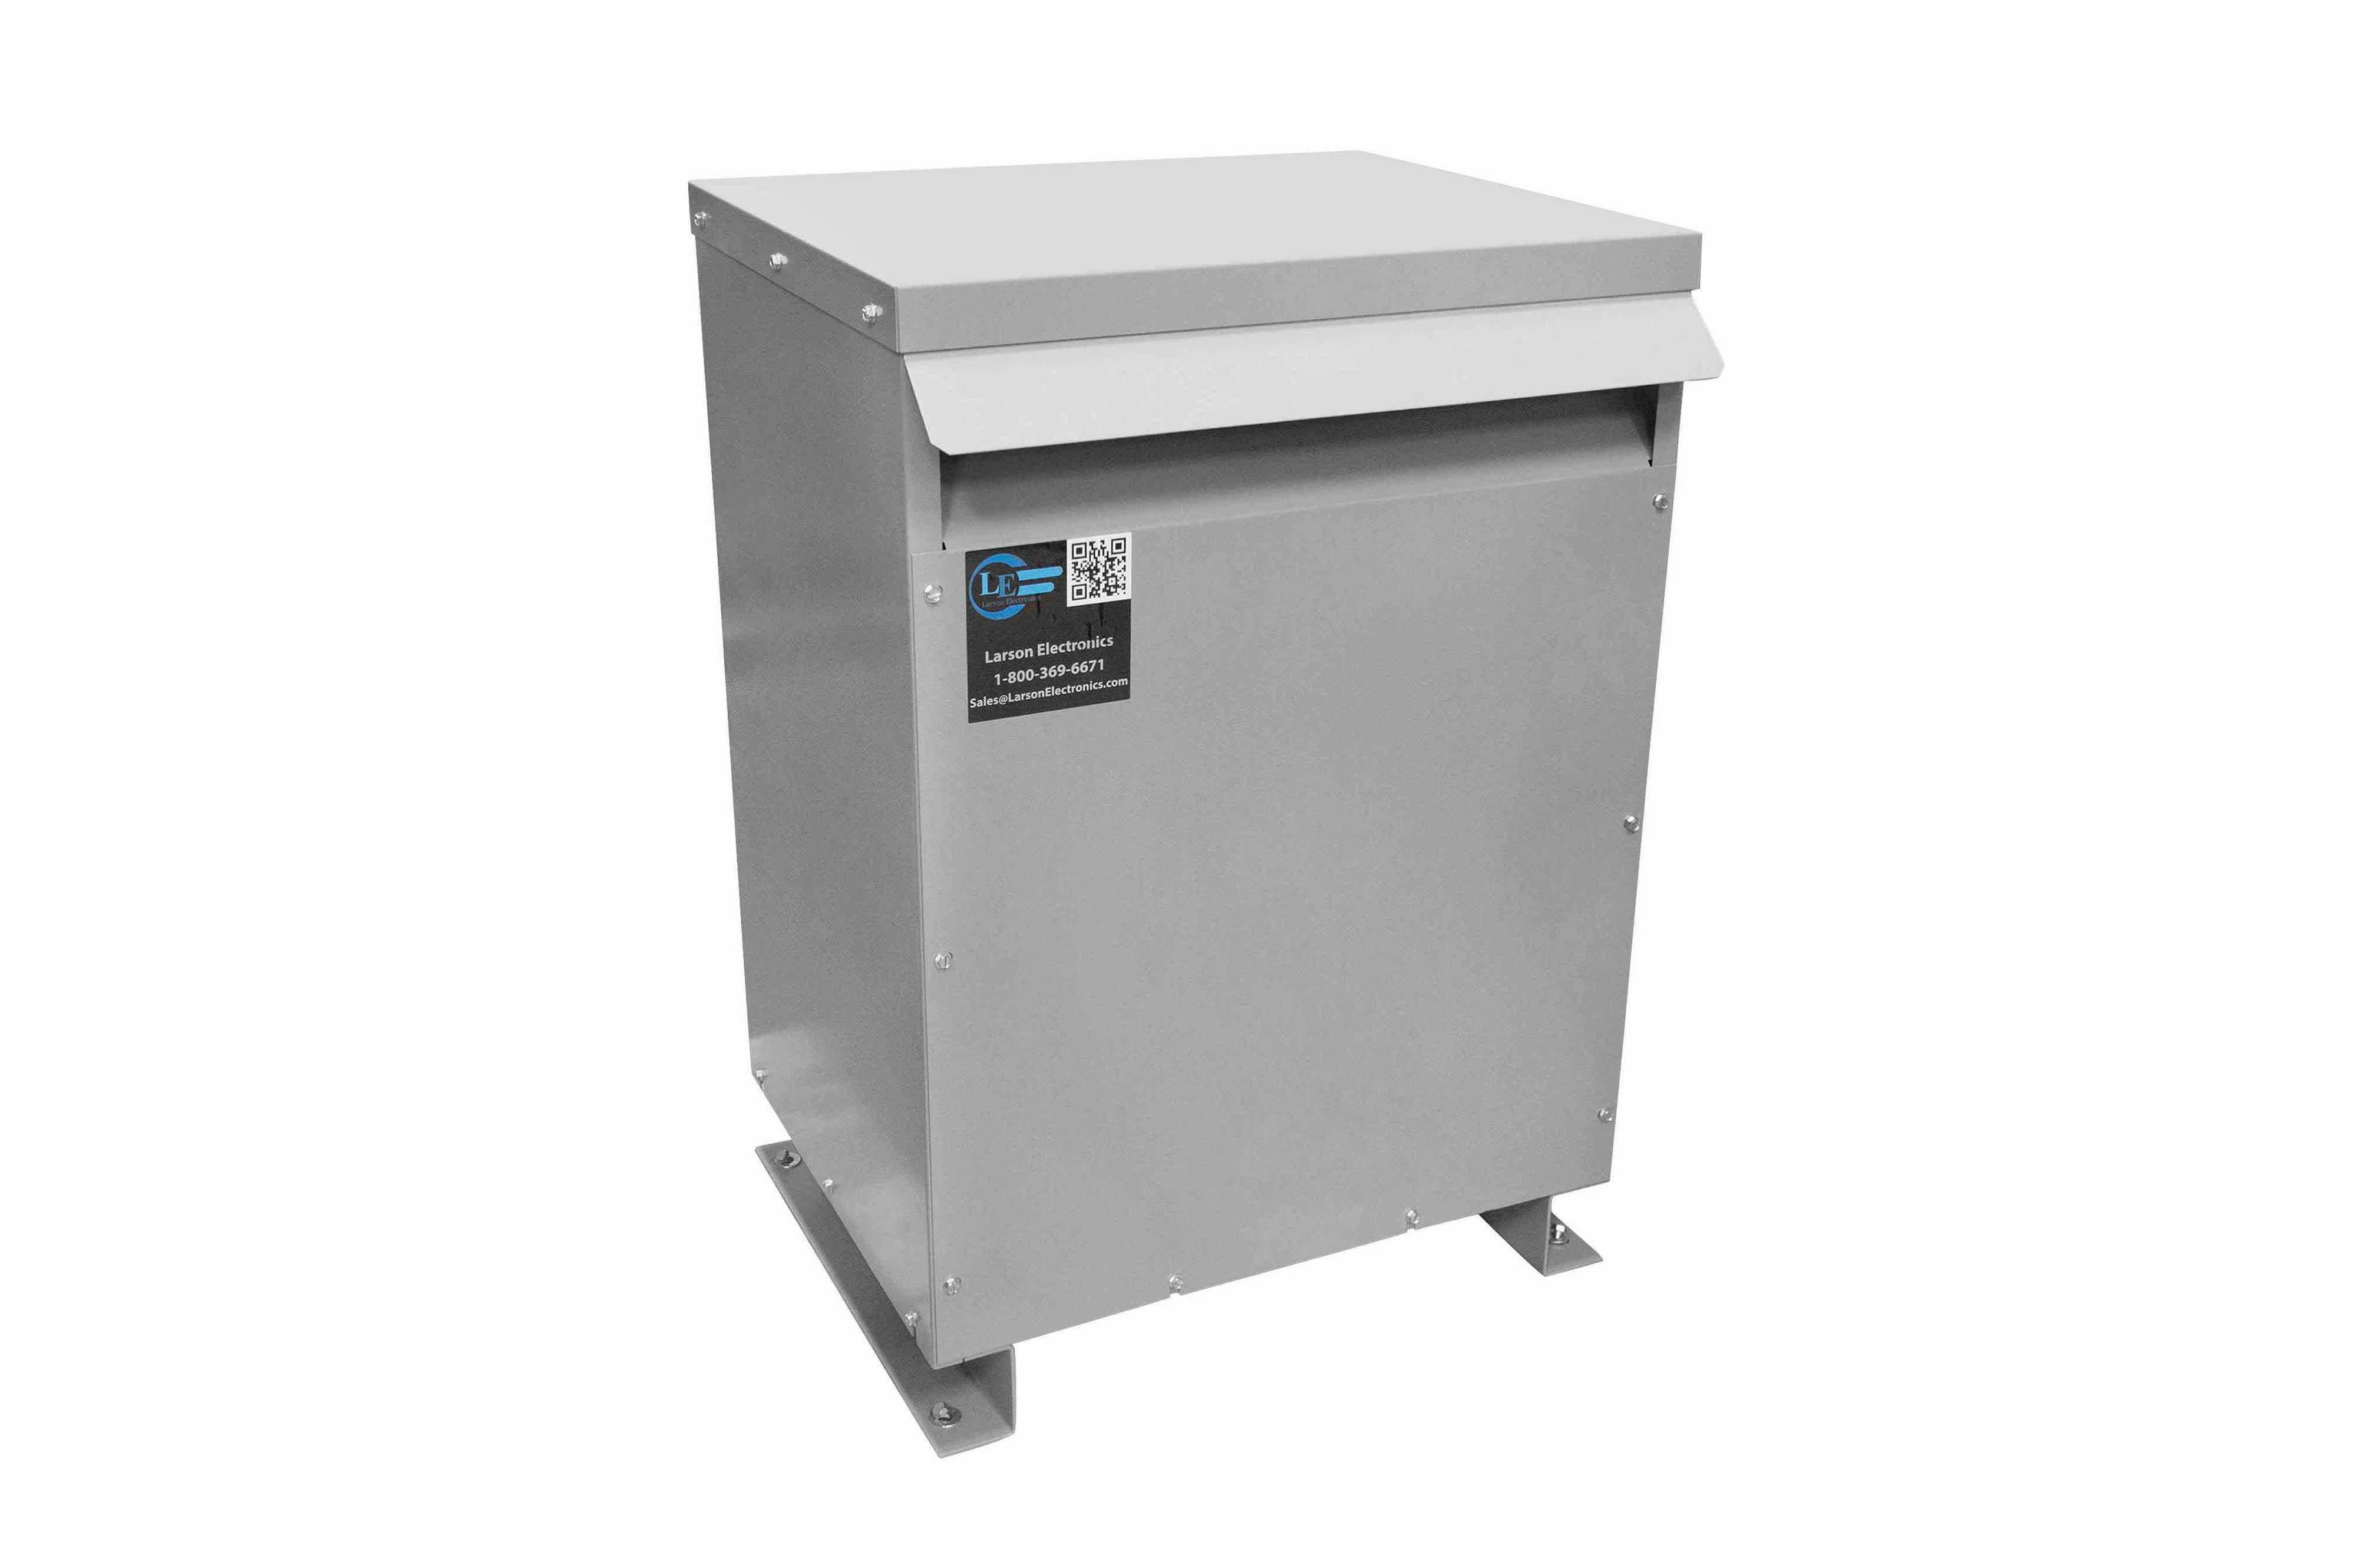 60 kVA 3PH Isolation Transformer, 230V Wye Primary, 208V Delta Secondary, N3R, Ventilated, 60 Hz